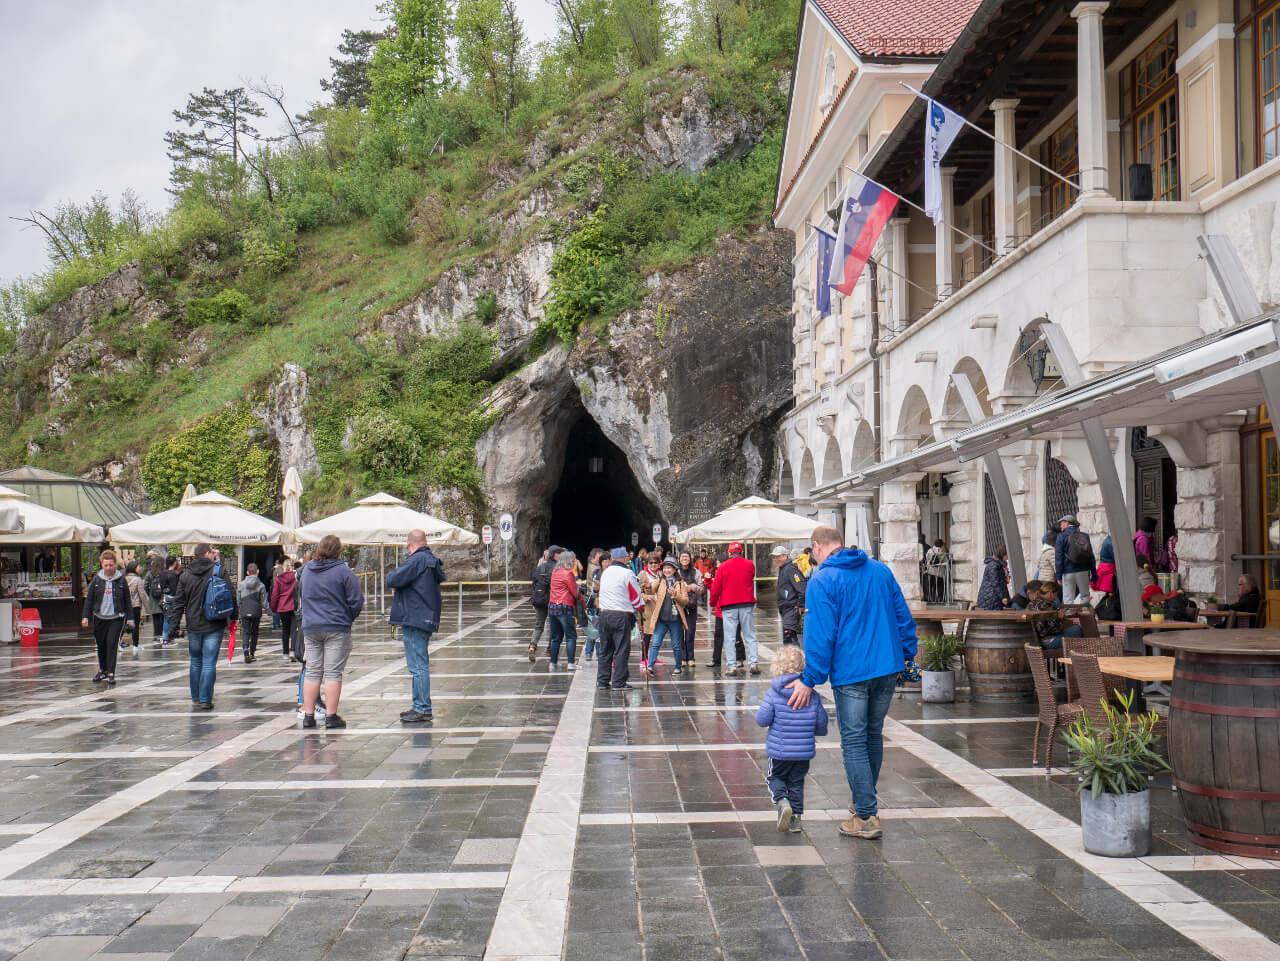 Wejście do jaskini Postojna